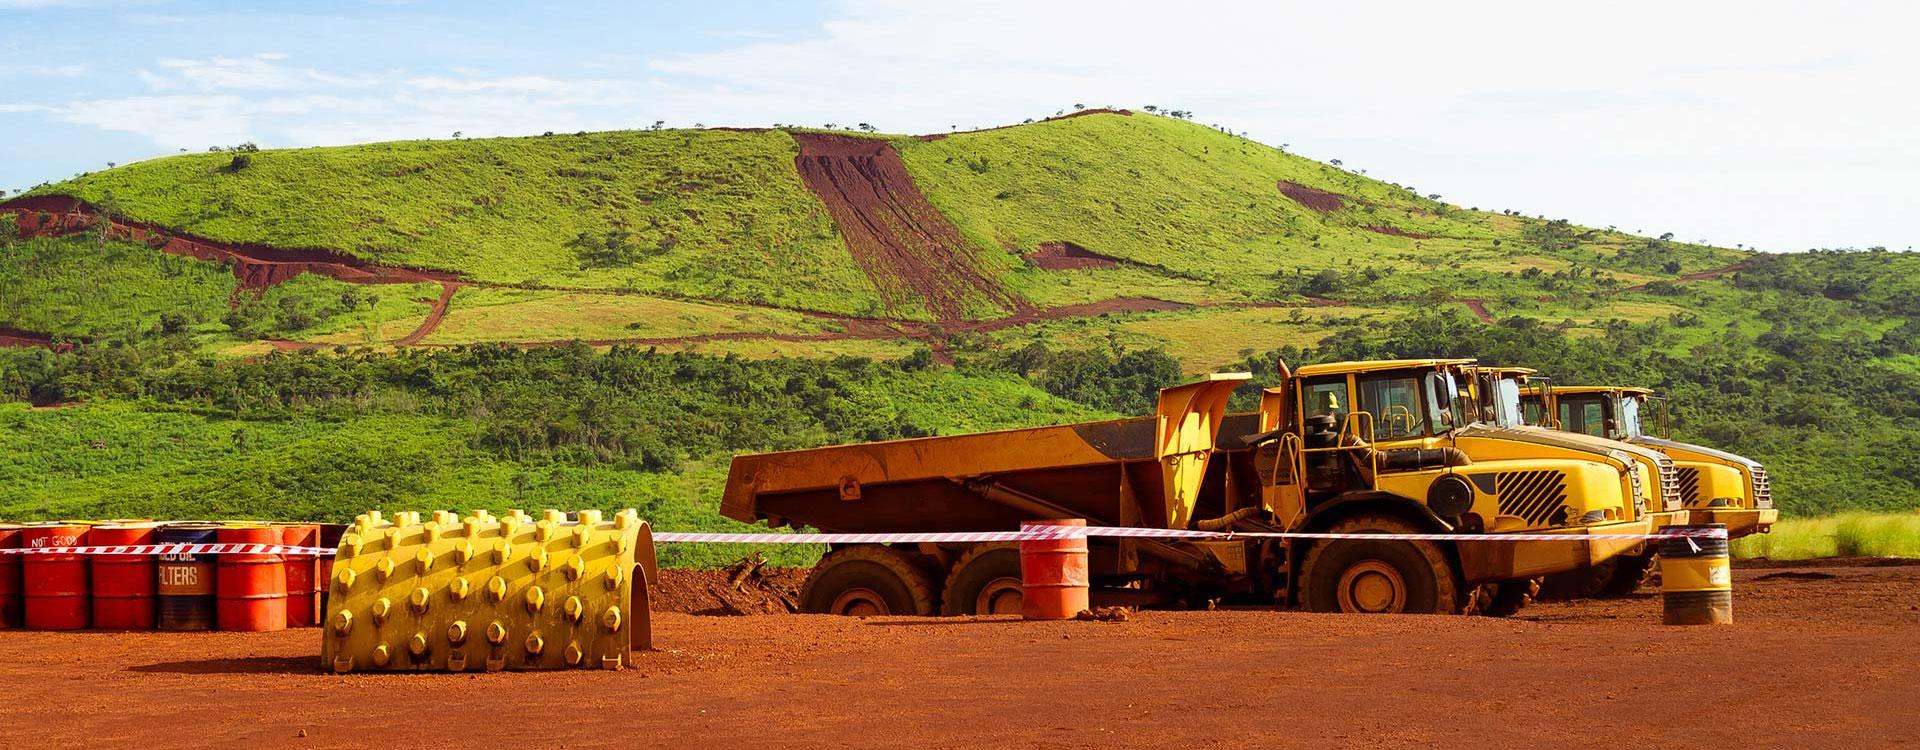 slider-mining-vehicles